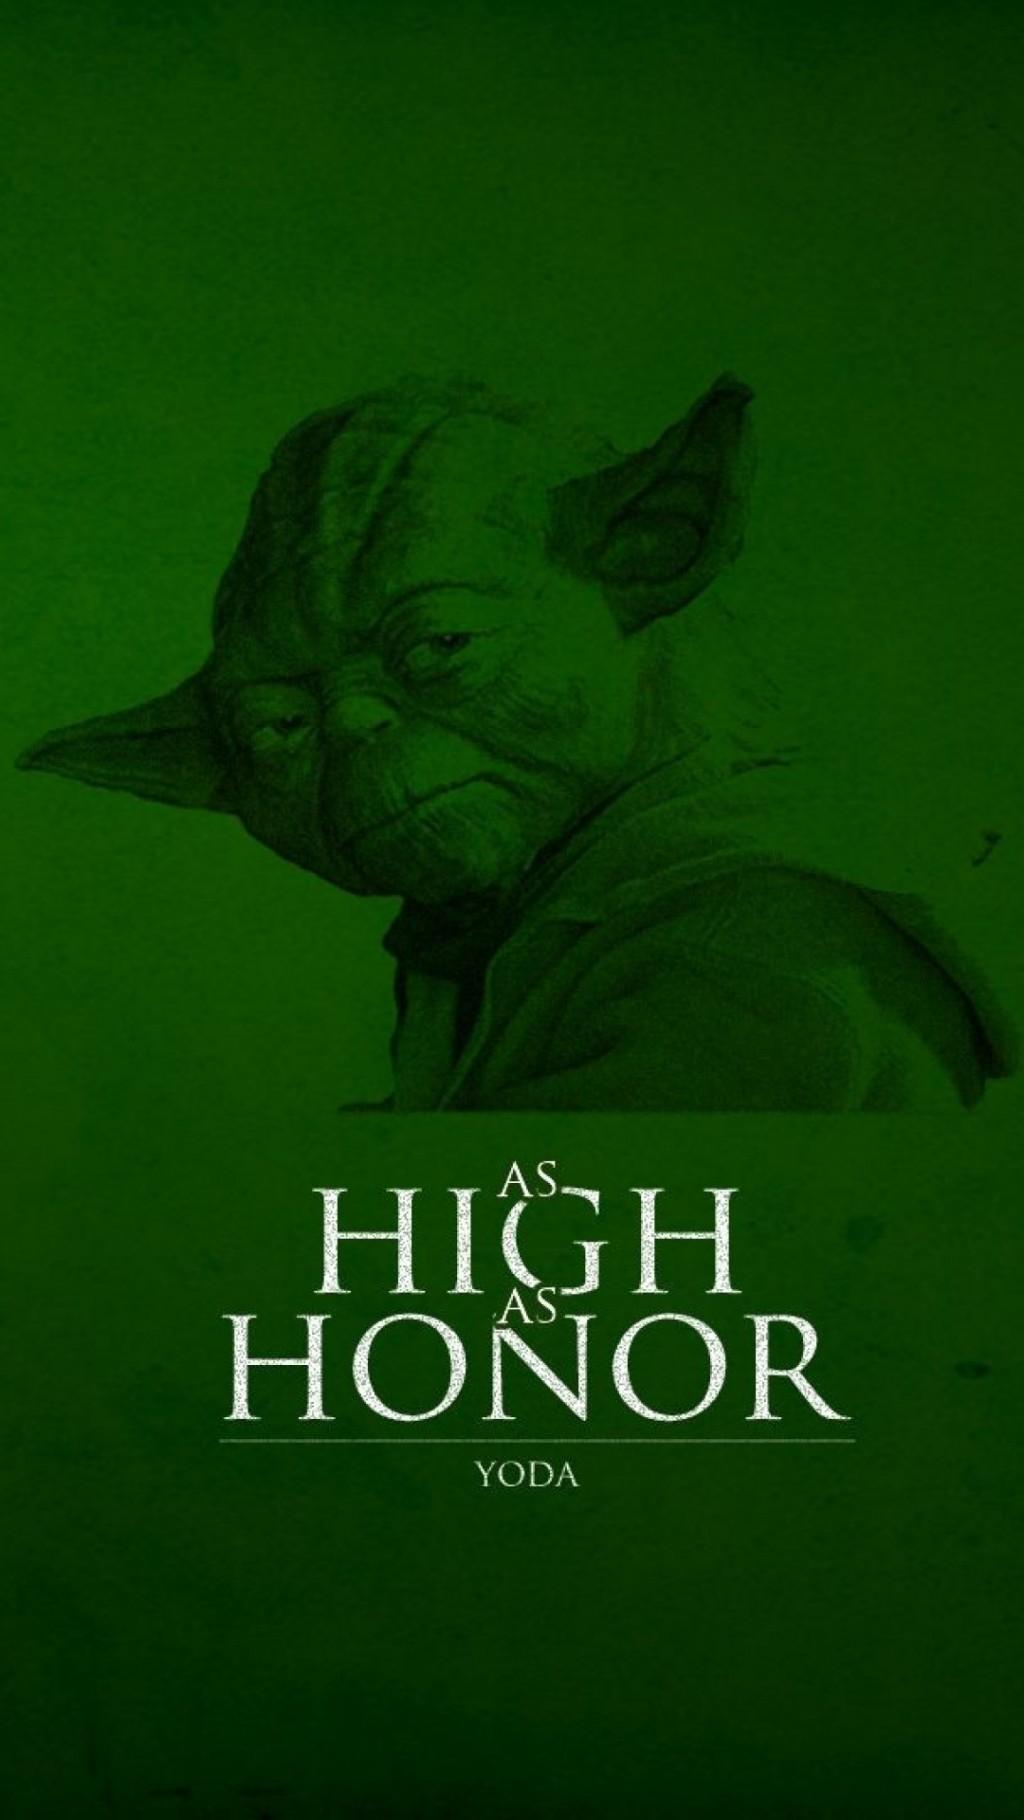 Yoda Wallpaper Star Wars photos of Epic Star Wars Iphone Wallpaper 1024x1820